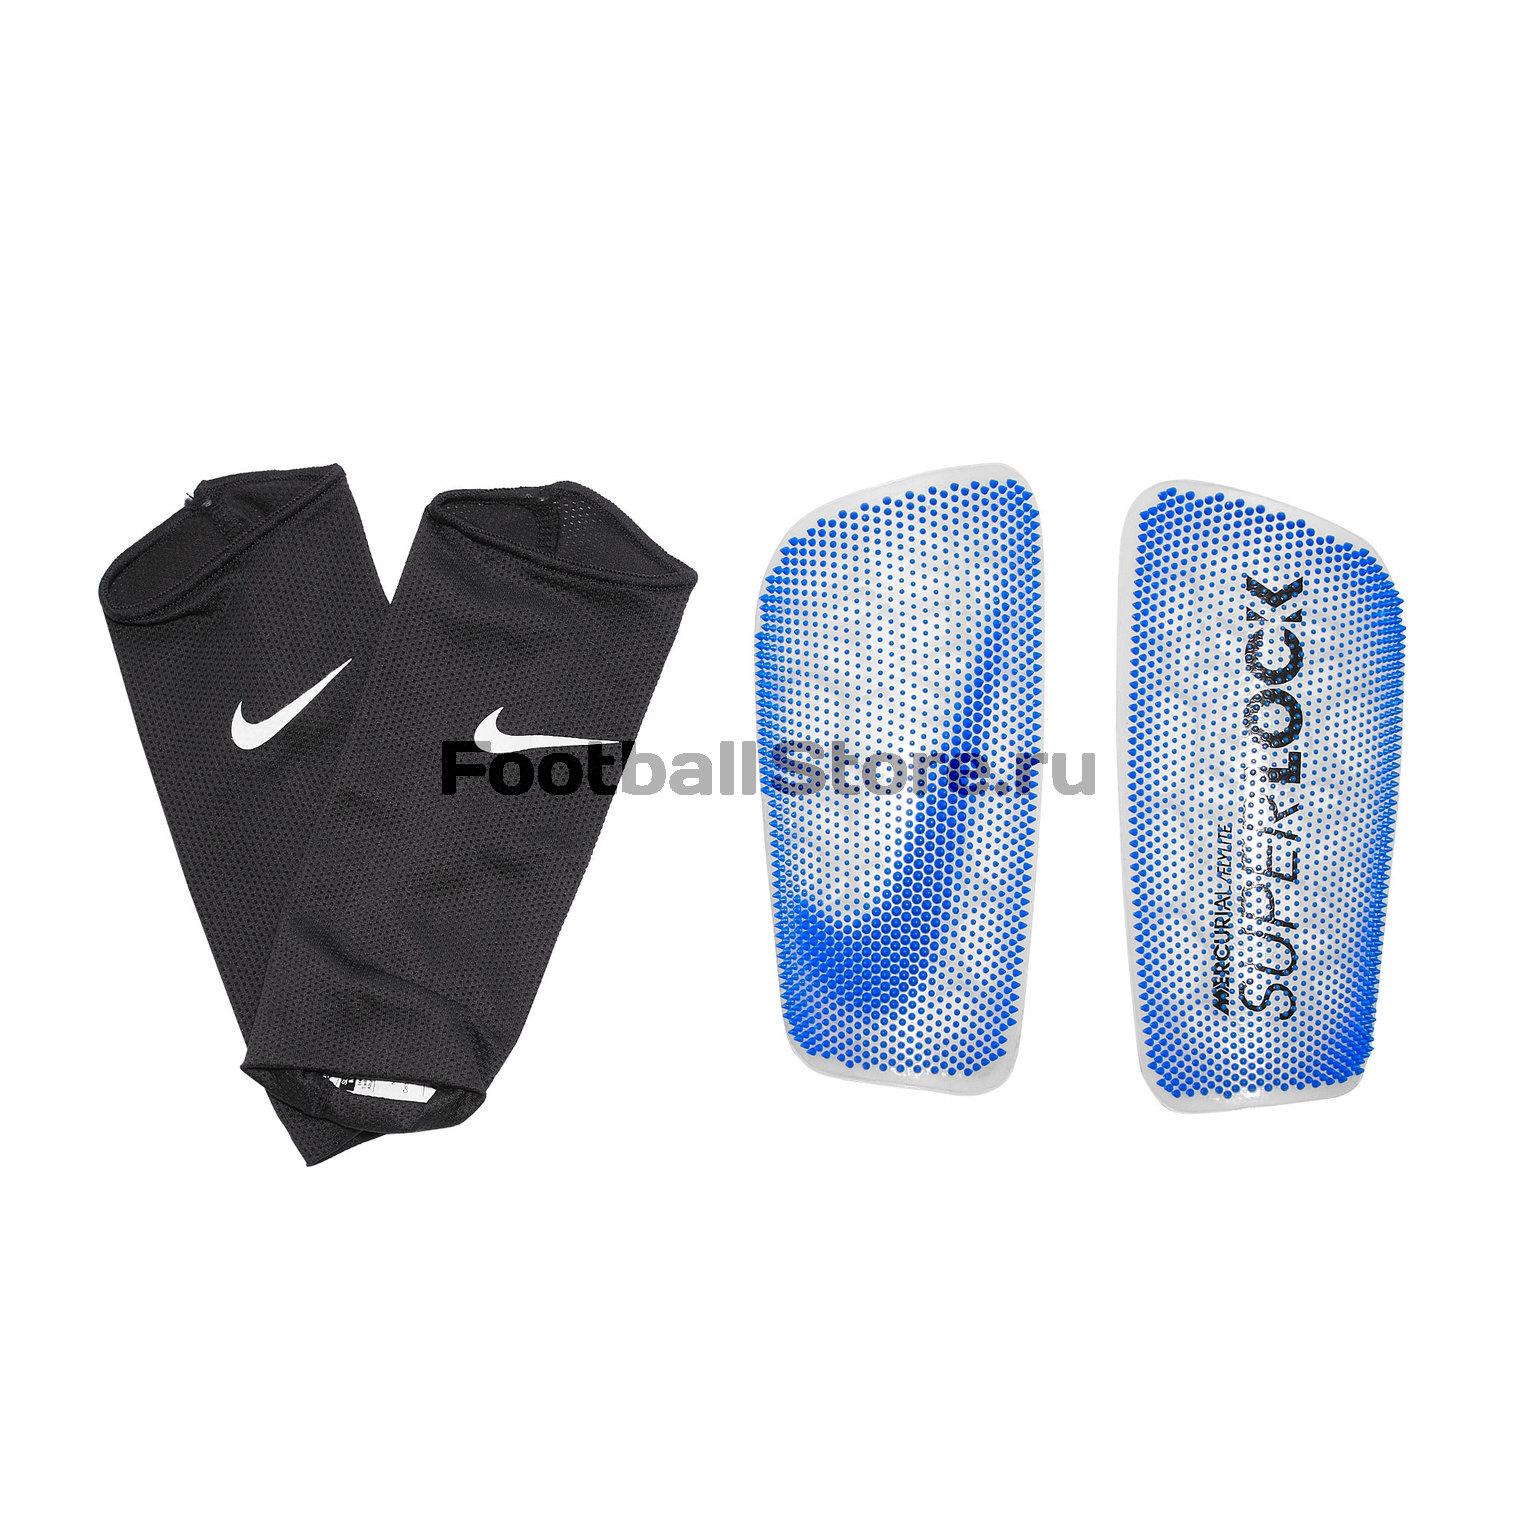 Щитки Nike Mercurial FlyLite SuperLock SP2160-410 щитки nike mercurial lite superlock sp2163 702